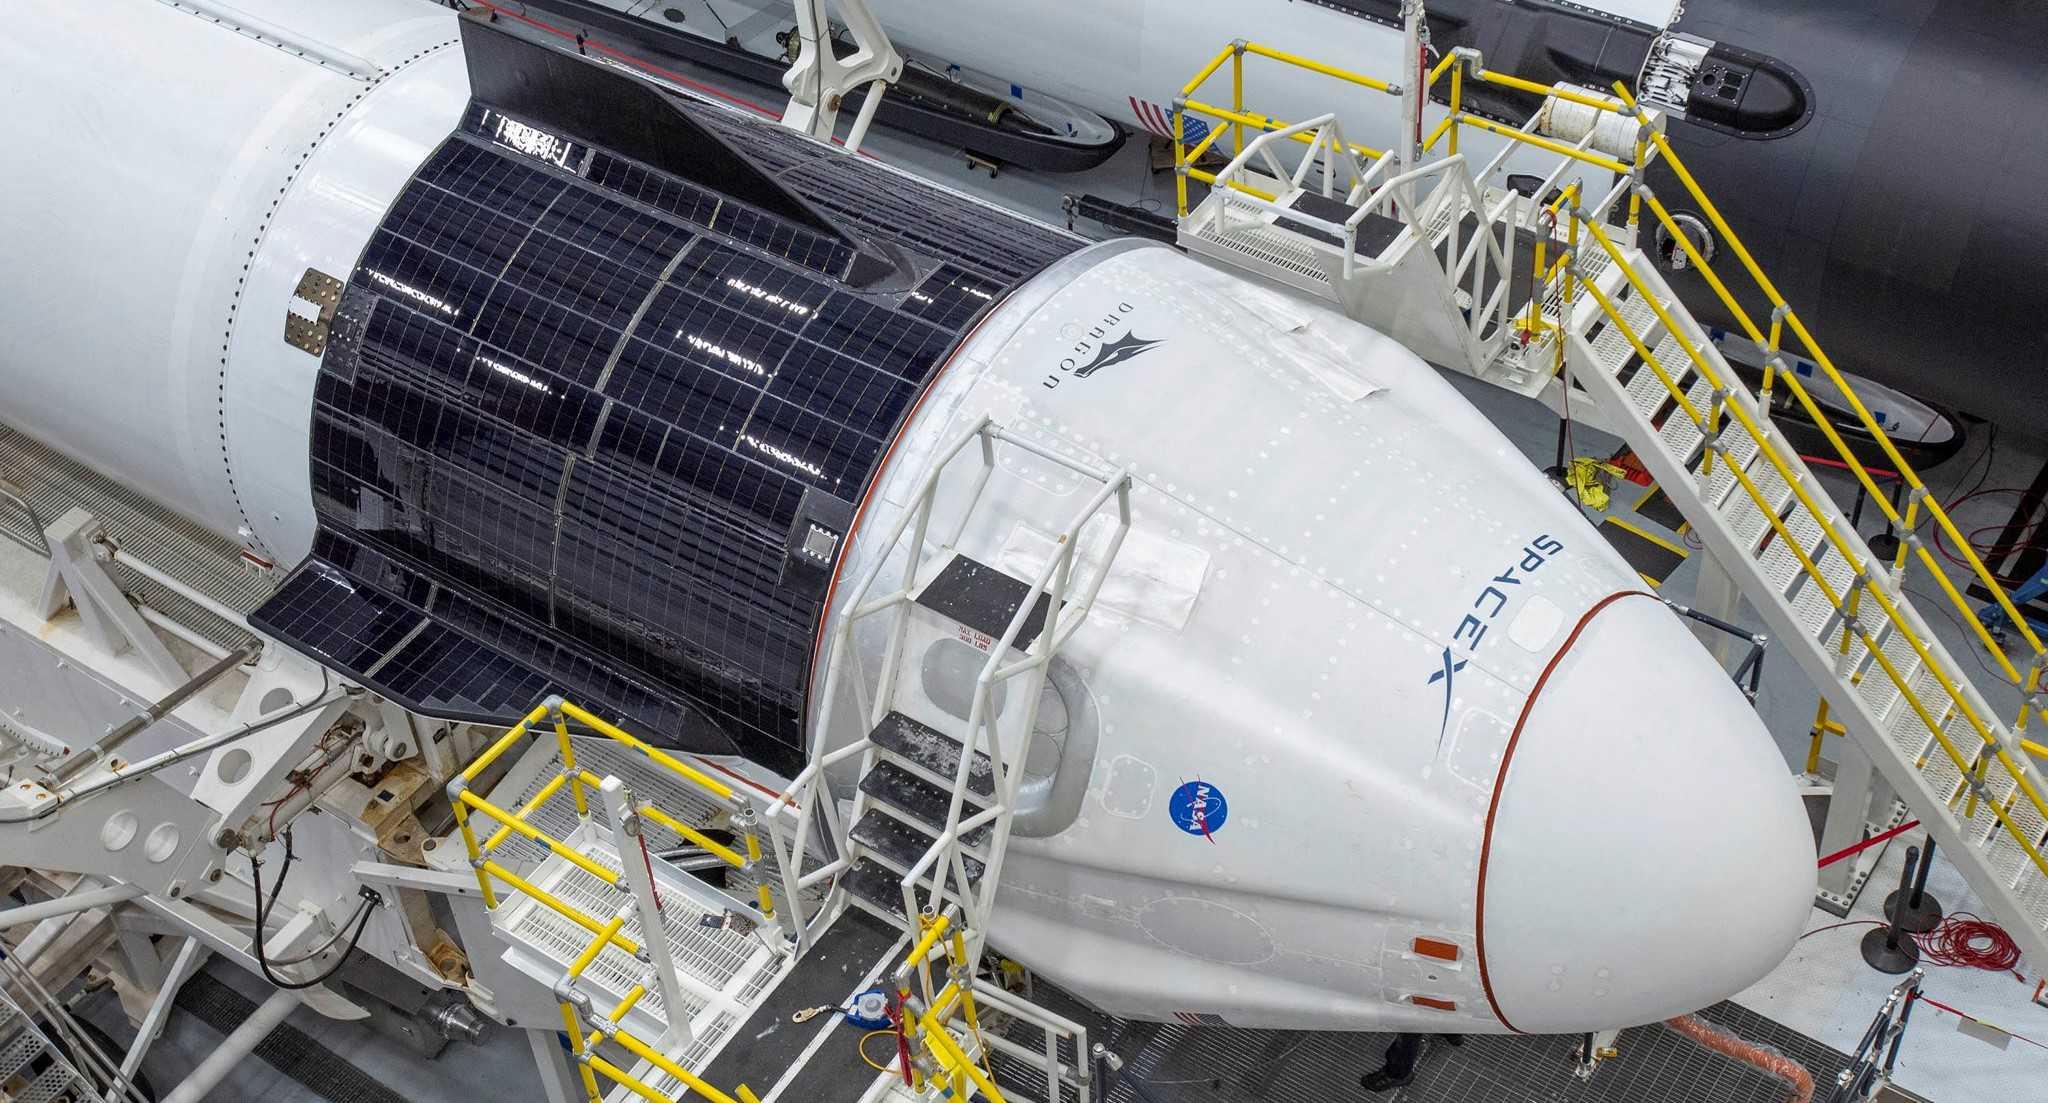 Demo-2 Crew Dragon C206 Falcon 9 S2 39A 052020 (SpaceX) 1 crop (c)